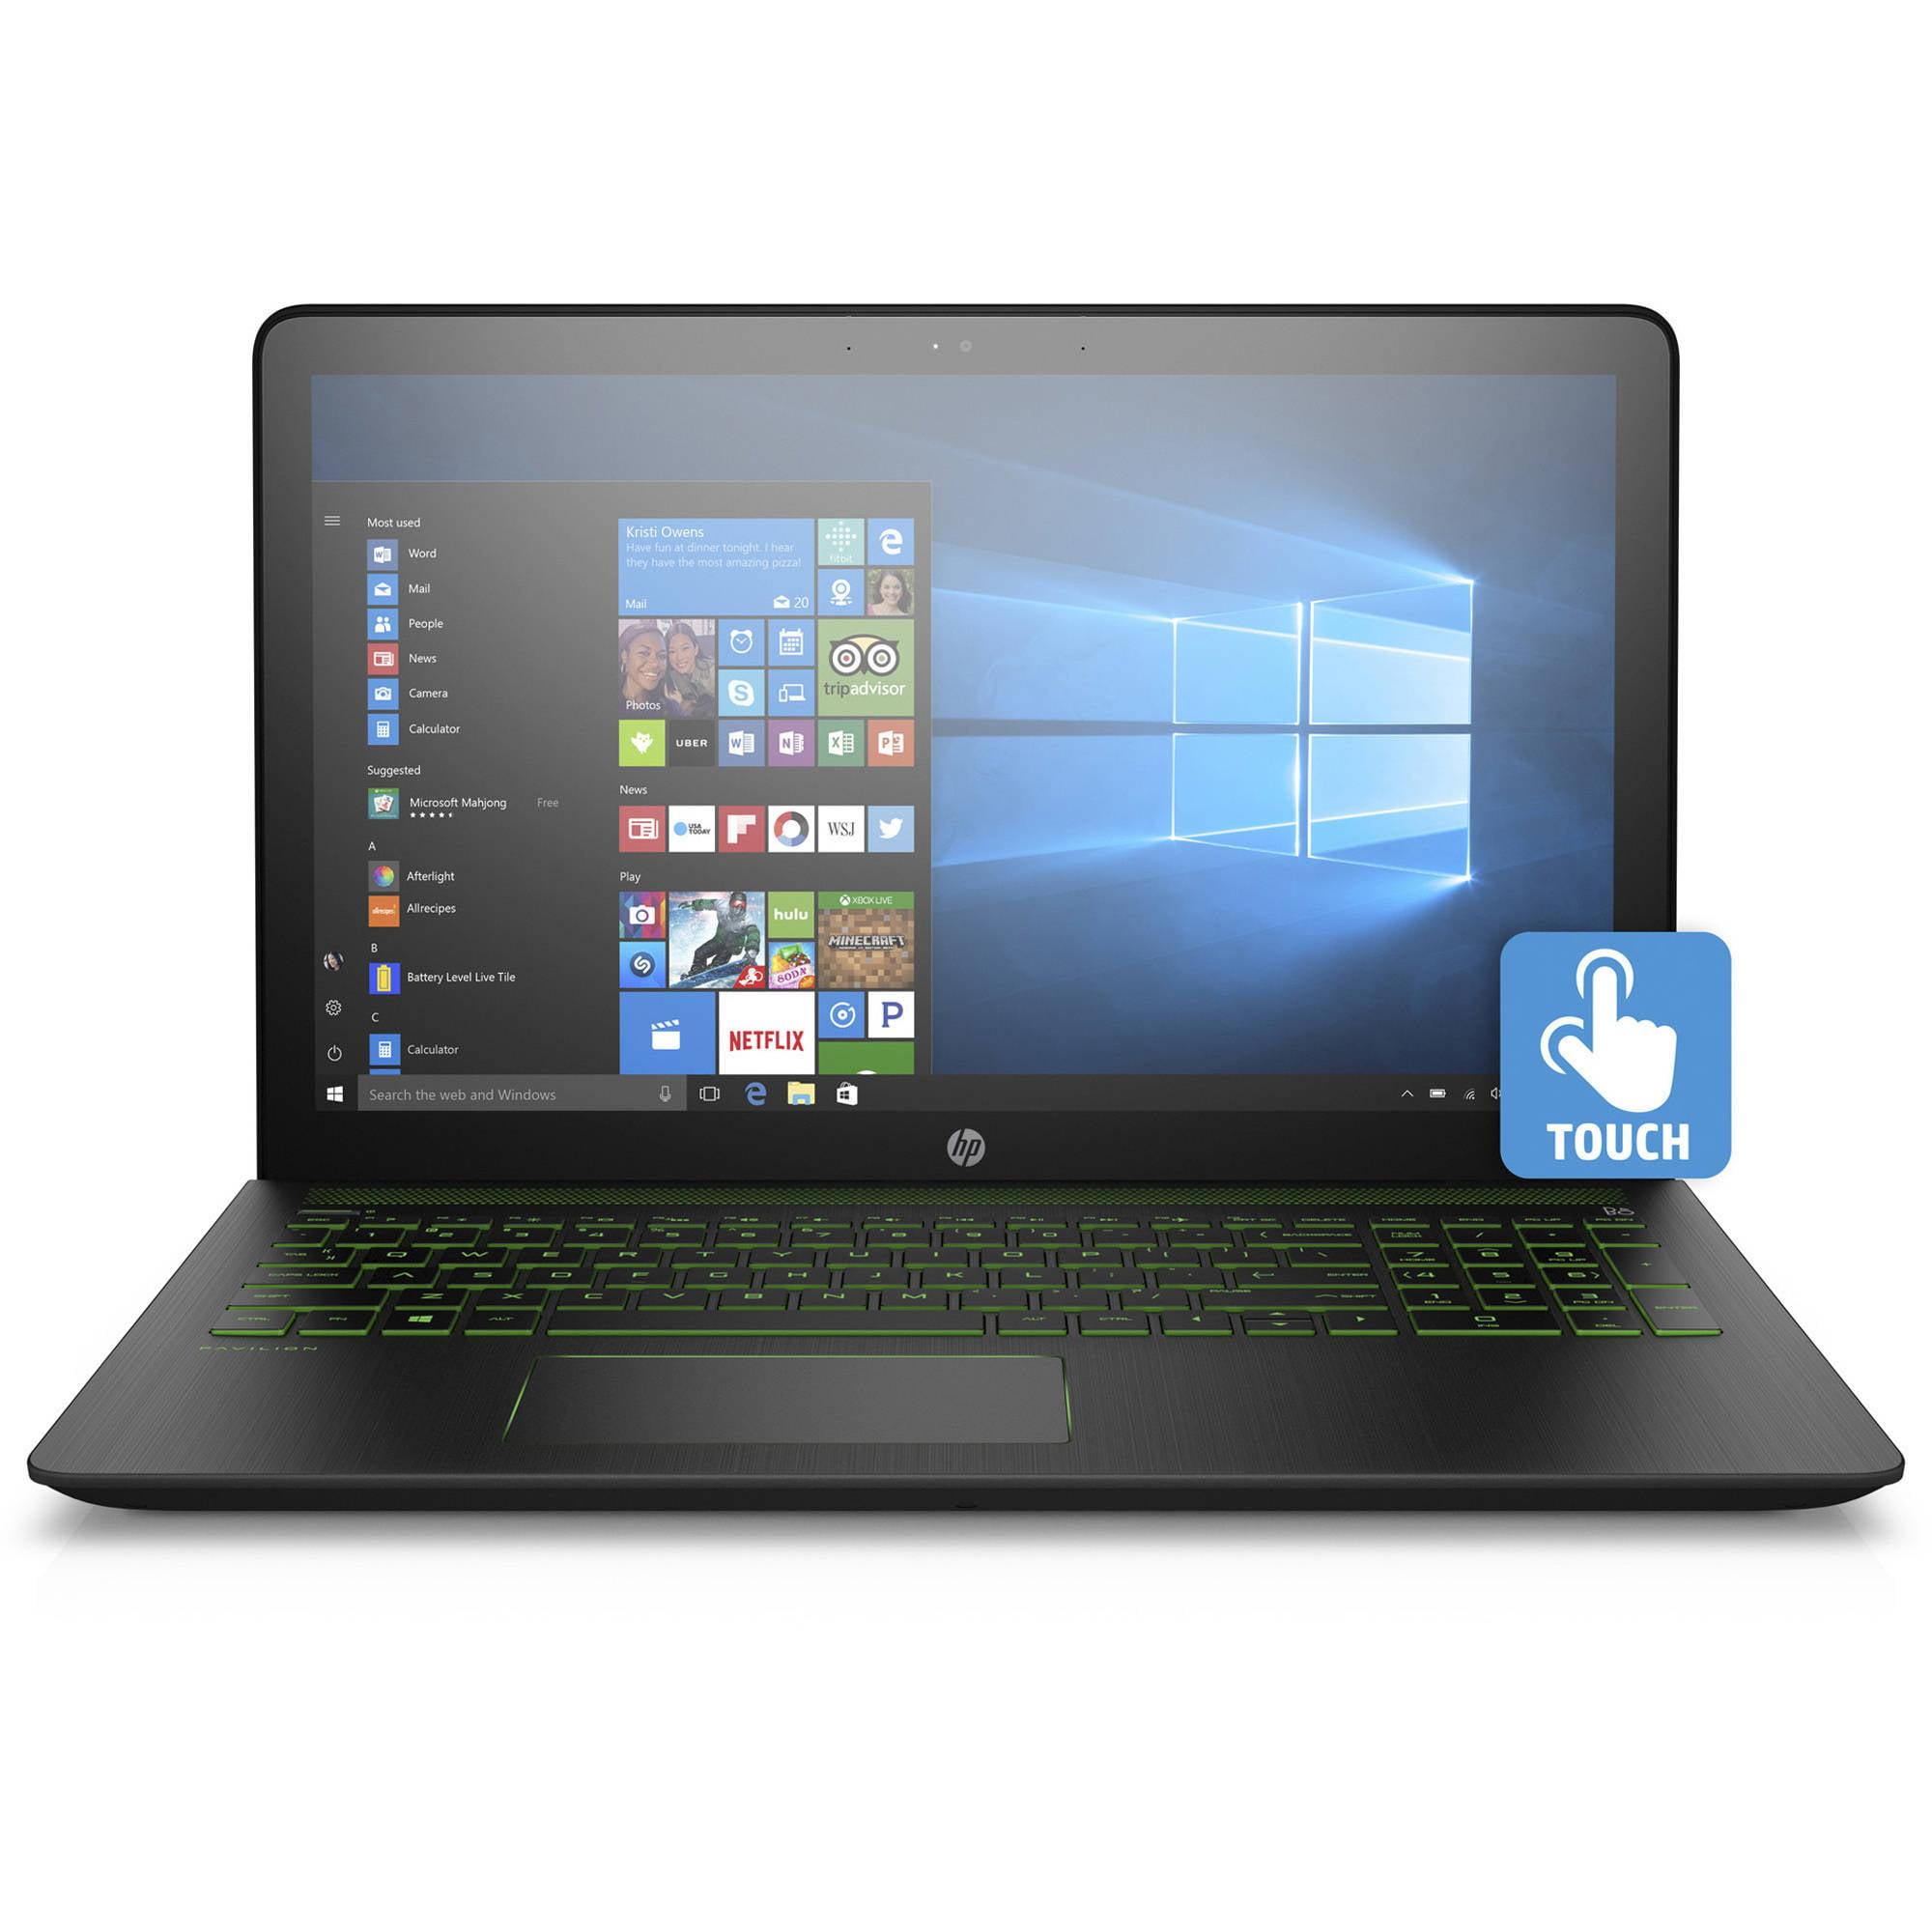 "HP Pavilion Power 15-Cb075Nr 15.6"" Laptop, Touchscreen, Windows 10 Home, Intel Core i5-7300HQ Quad-Core... by HP"